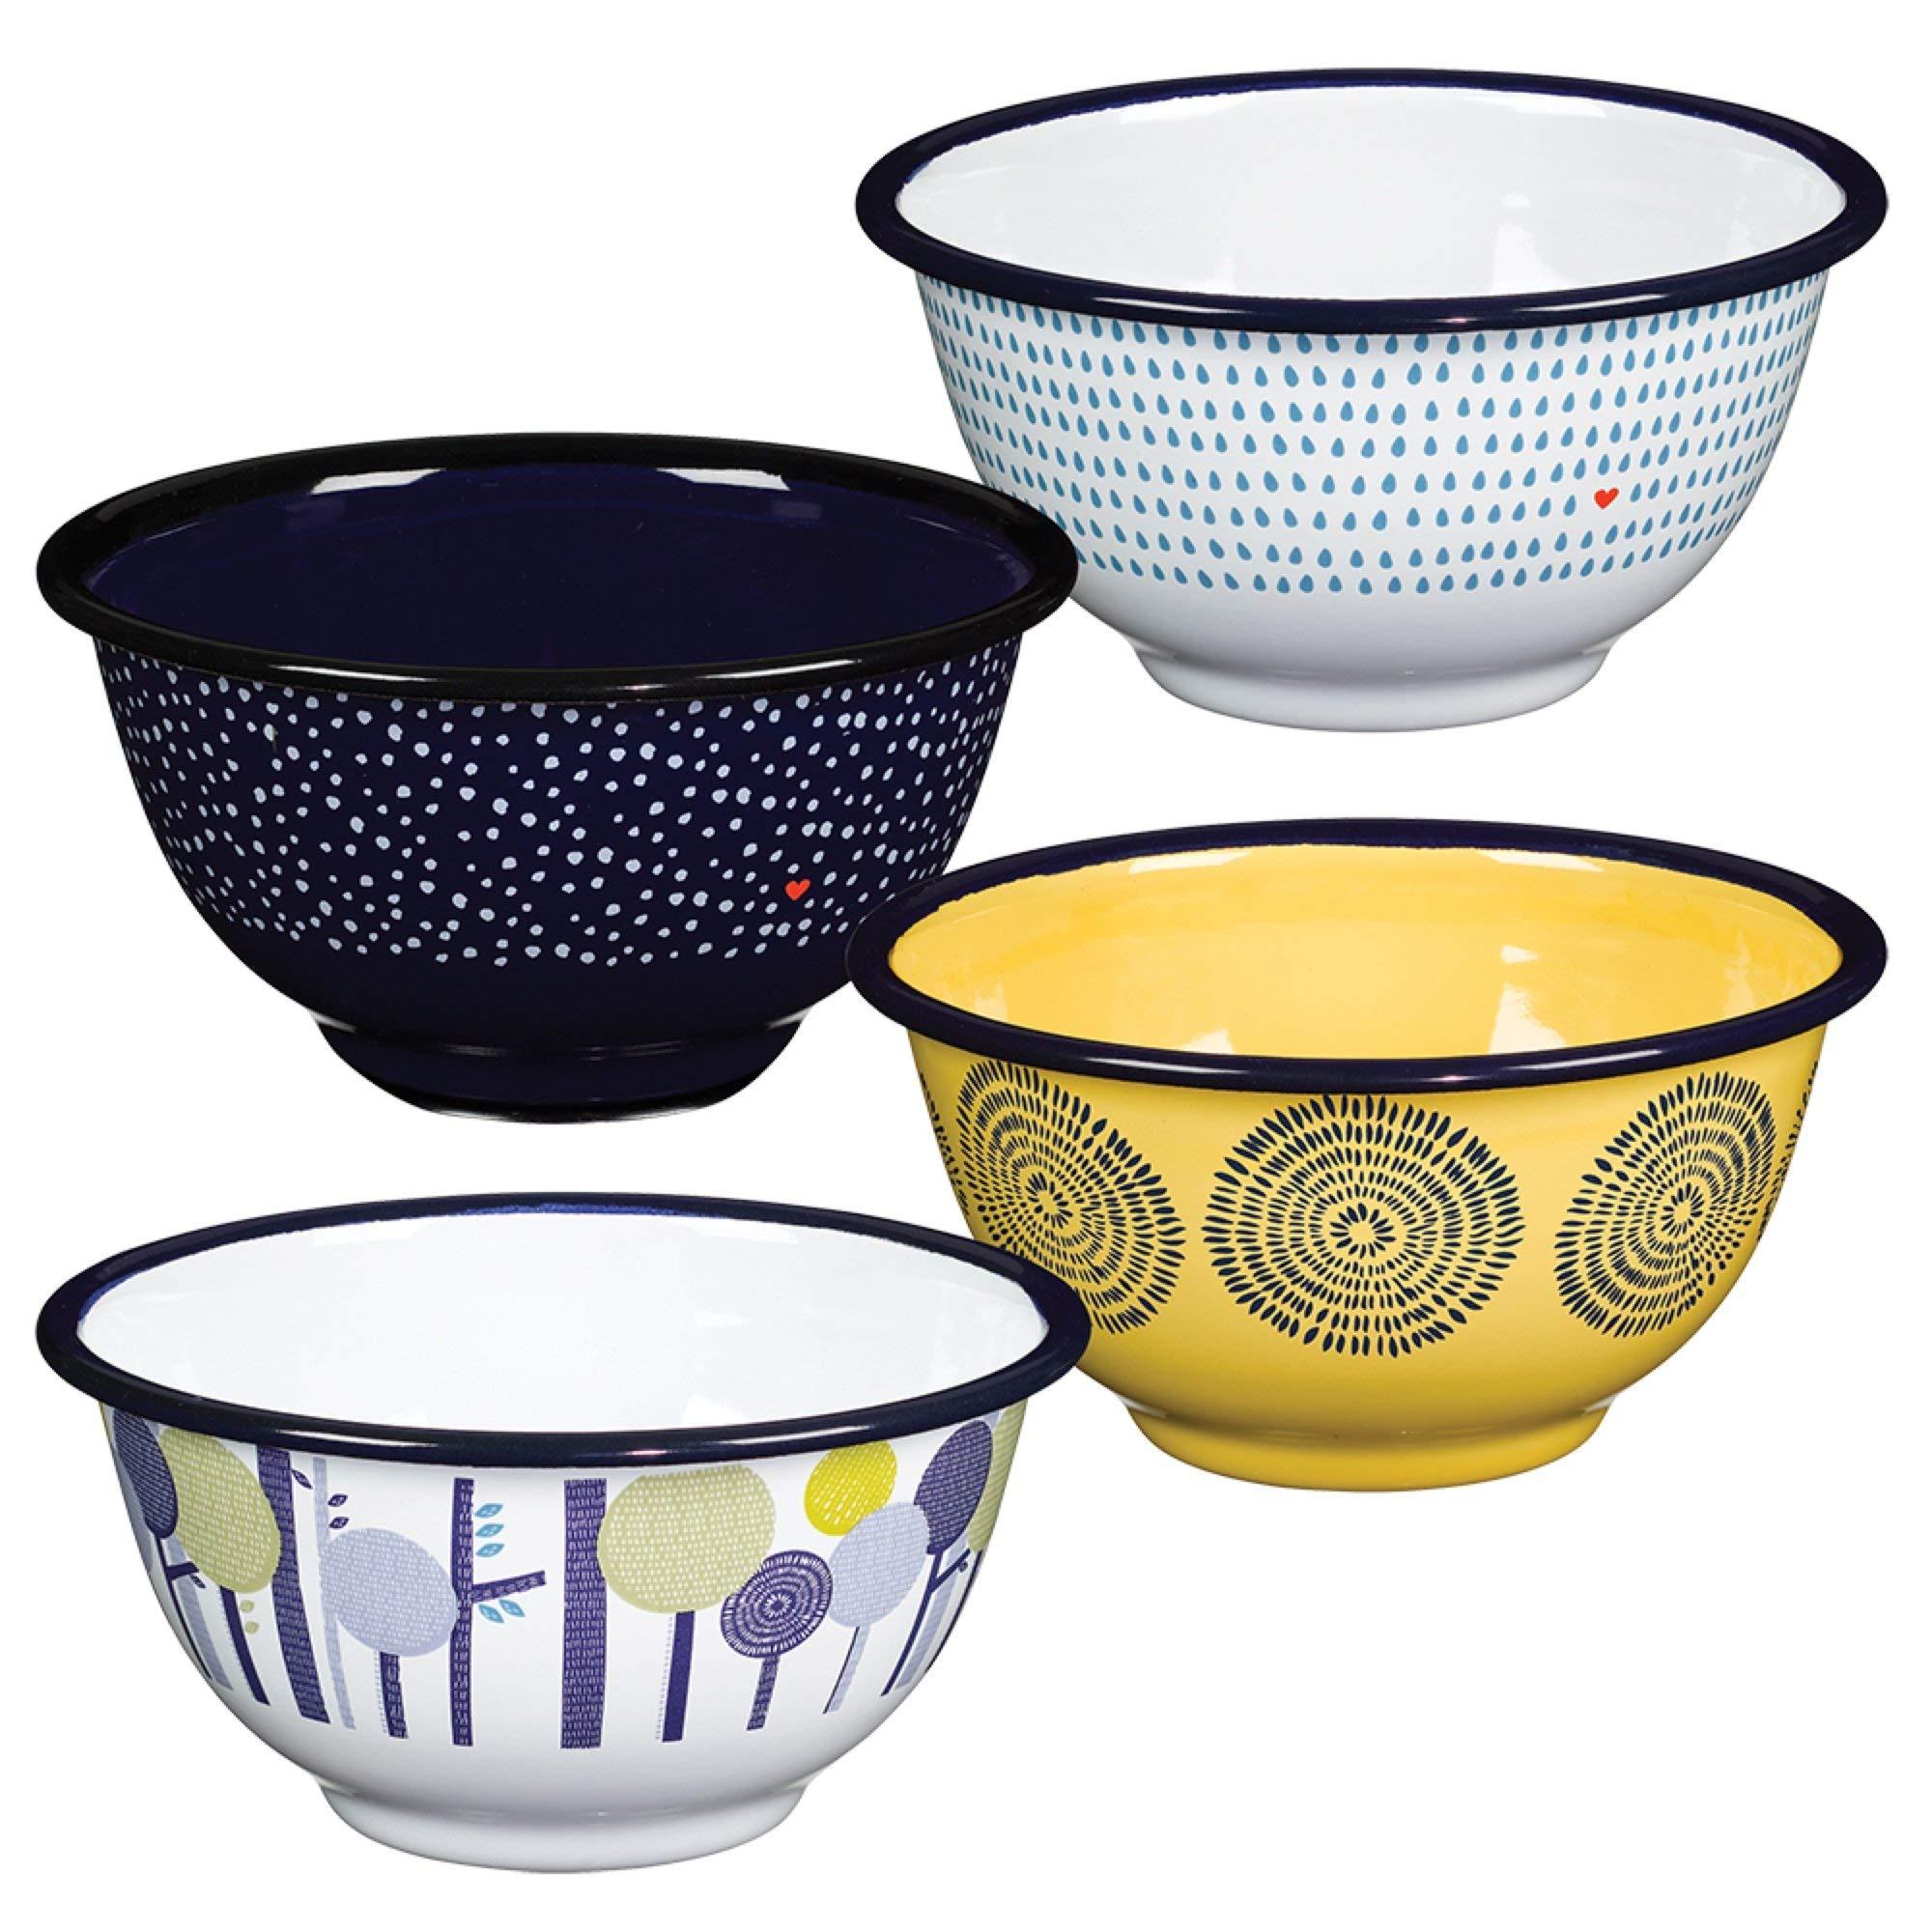 Folklore Enamel Bowls, Seasons Designs (Set of 4) by Folklore (Image #3)